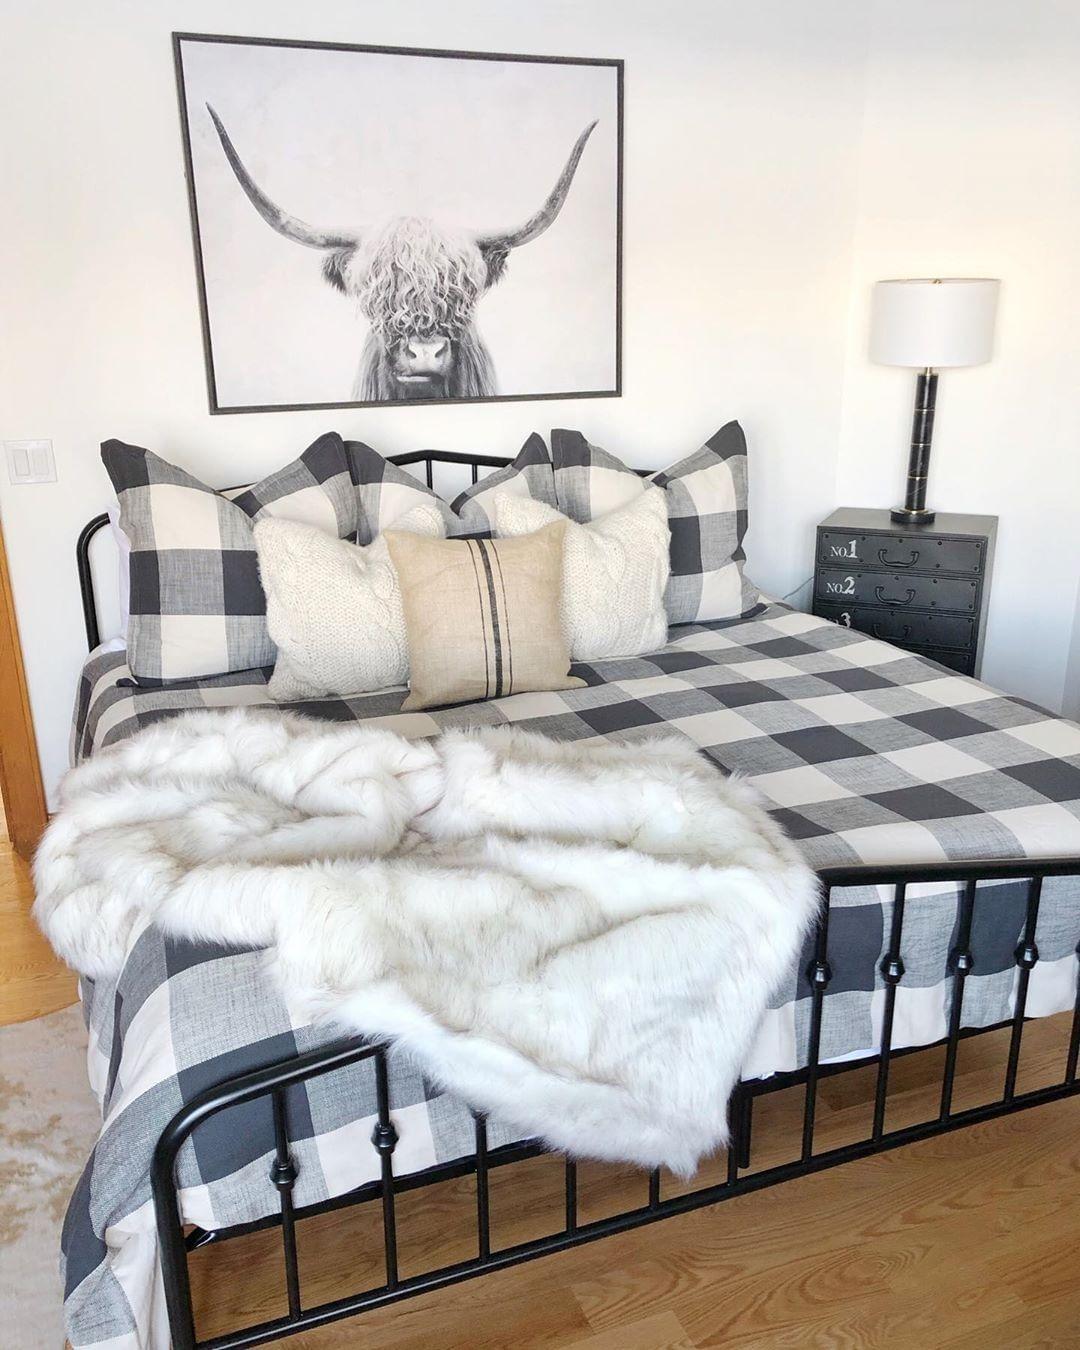 Modern farmhouse guest bedroom inspo care of sbkliving